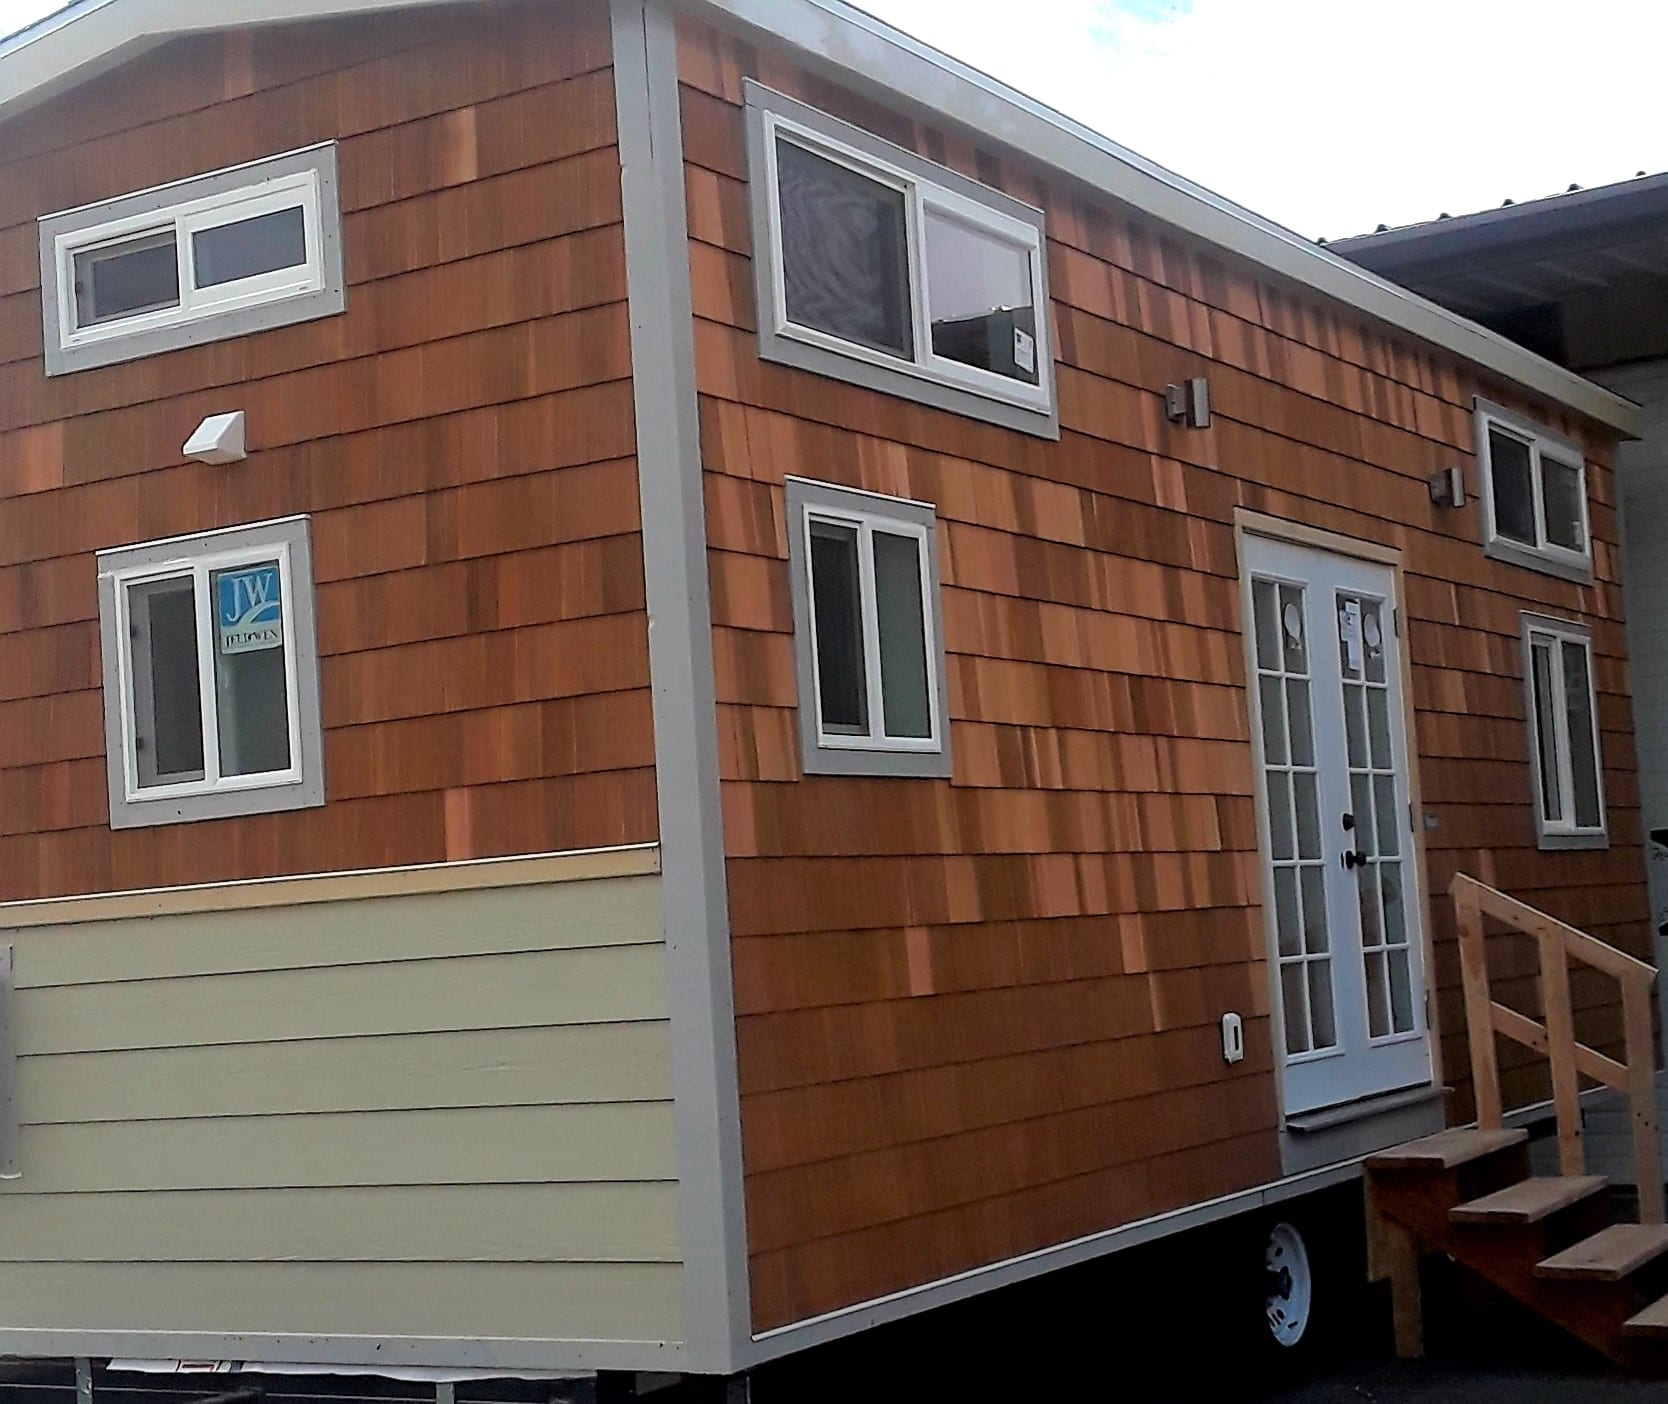 Certified Park Model Tiny Home As DADU In Lynnwood